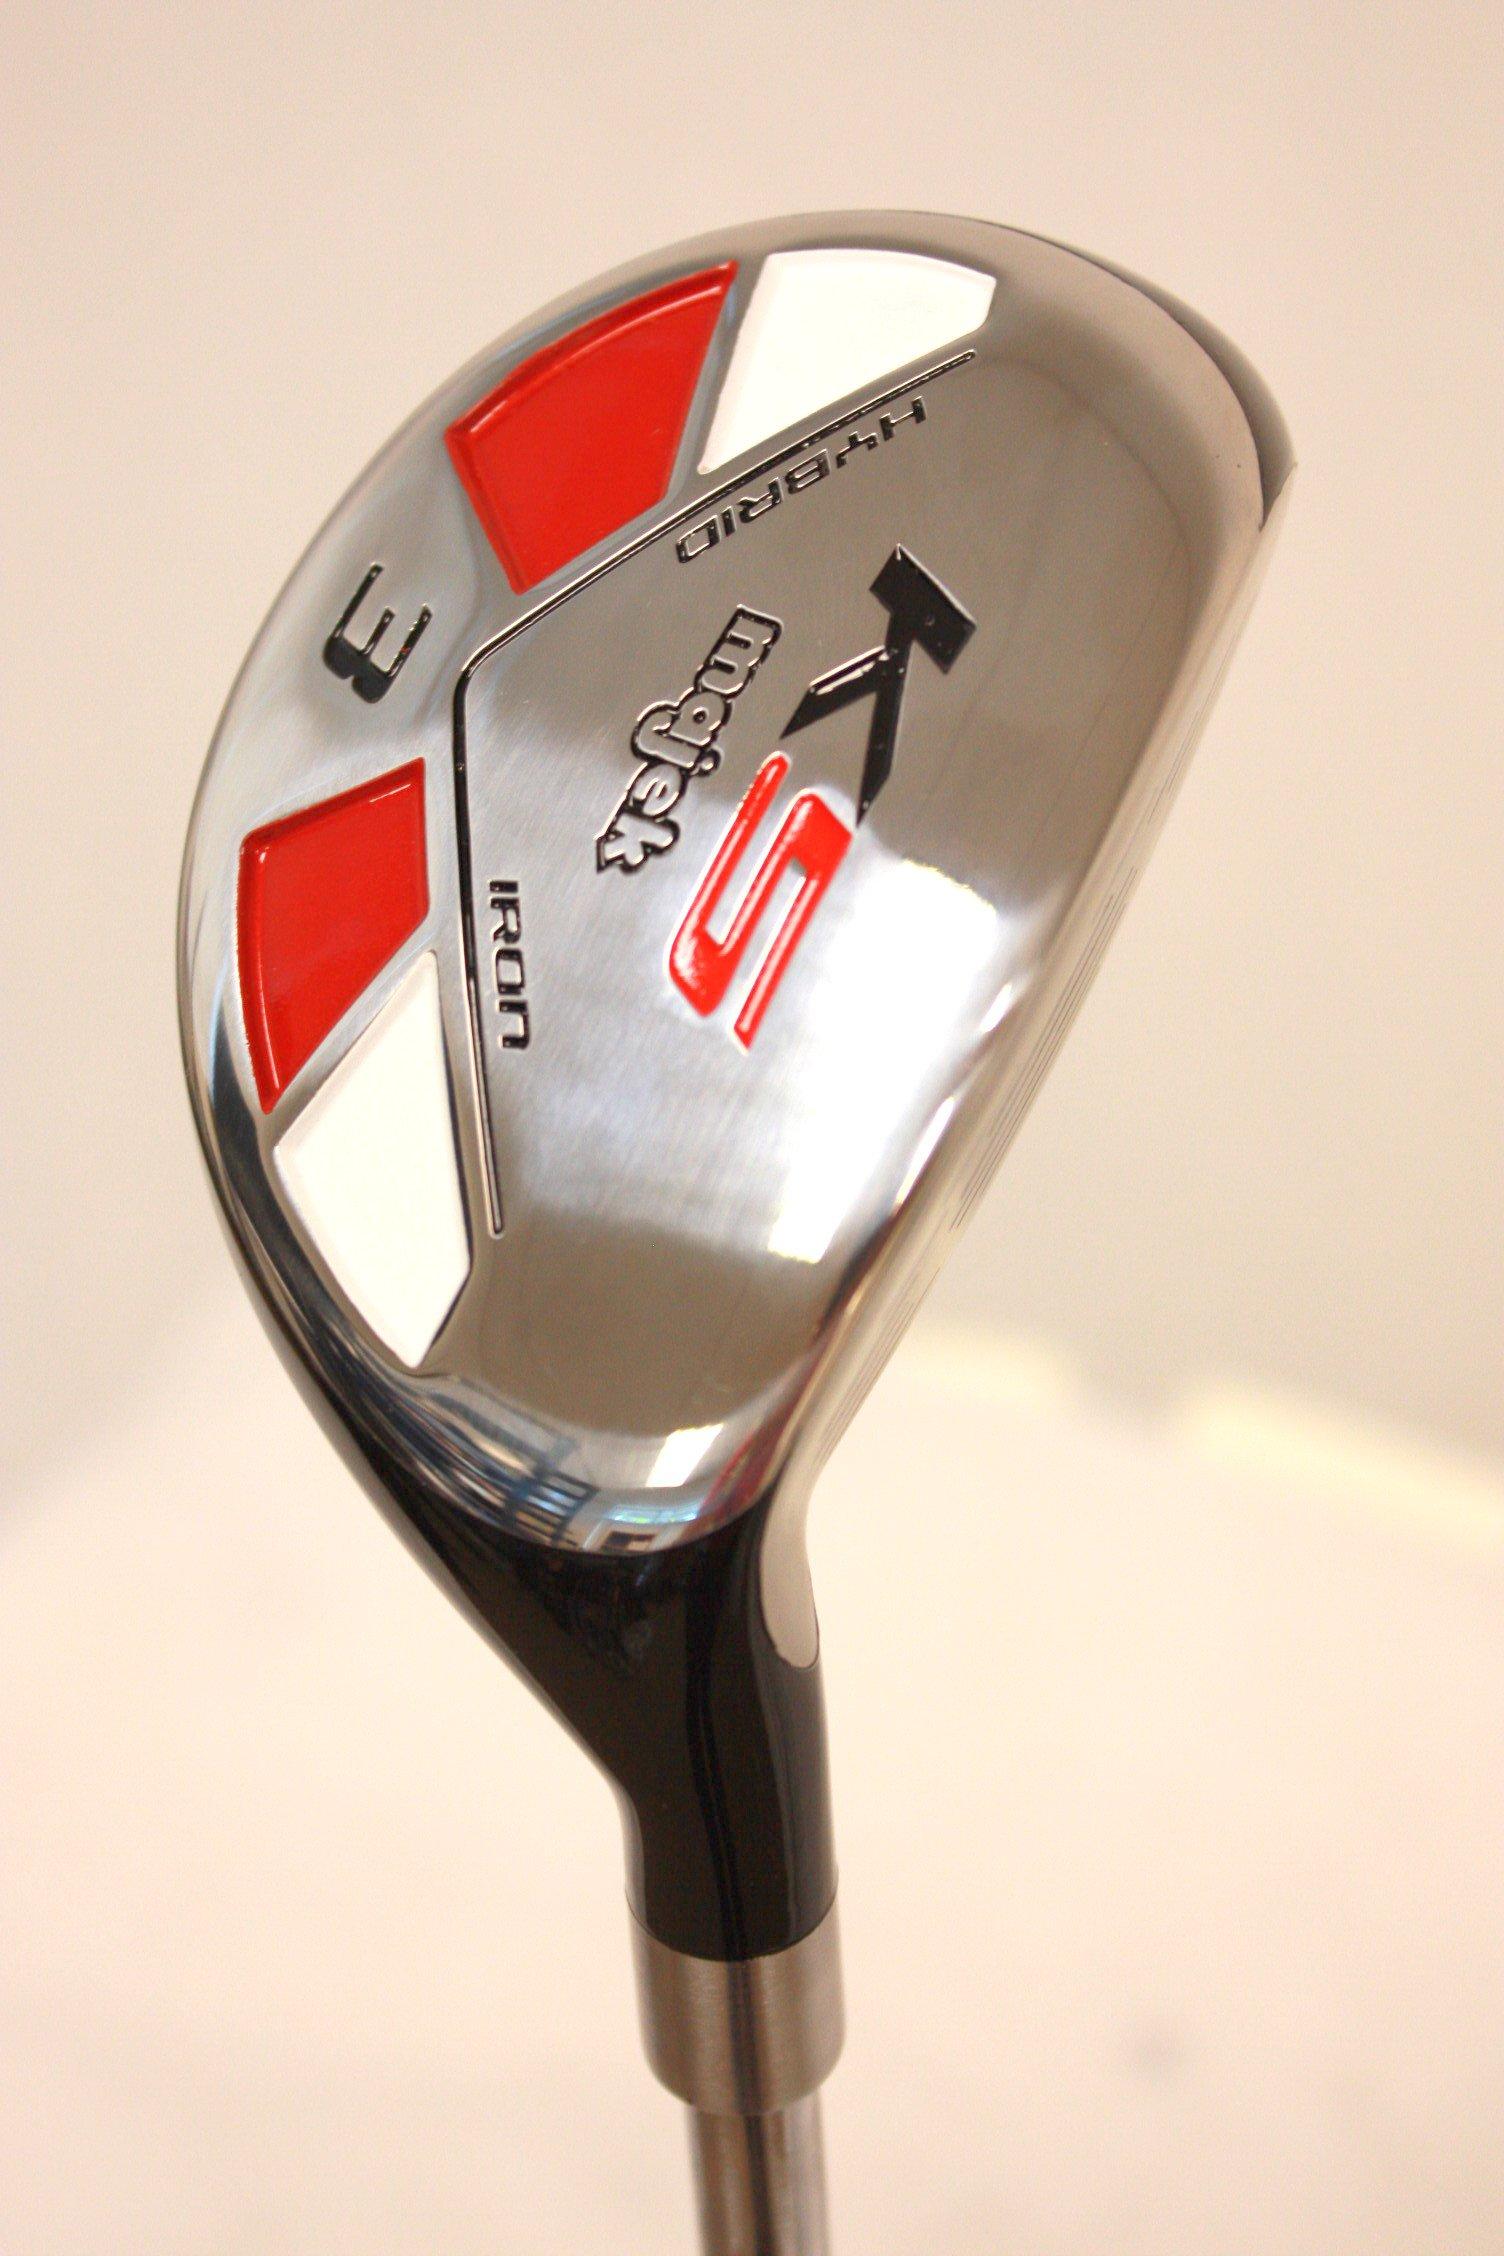 "Women's Majek Golf All Ladies Hybrid #3 Lady Flex Right Handed New Rescue Utility ""L"" Flex Club"